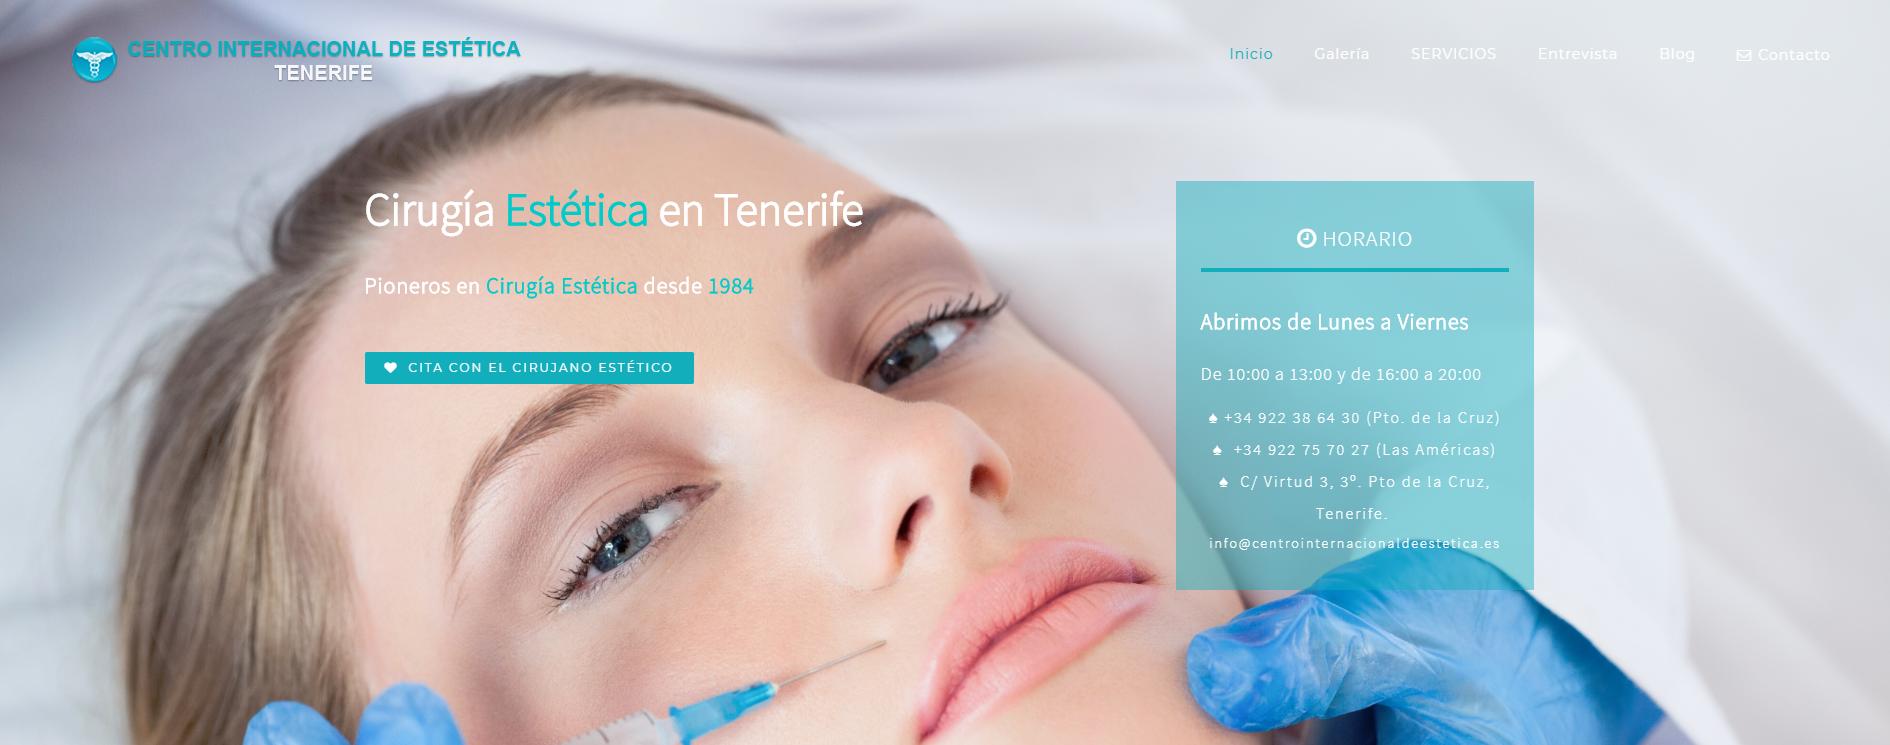 Diseño Web en Tenerife Centro Internacional de Estética